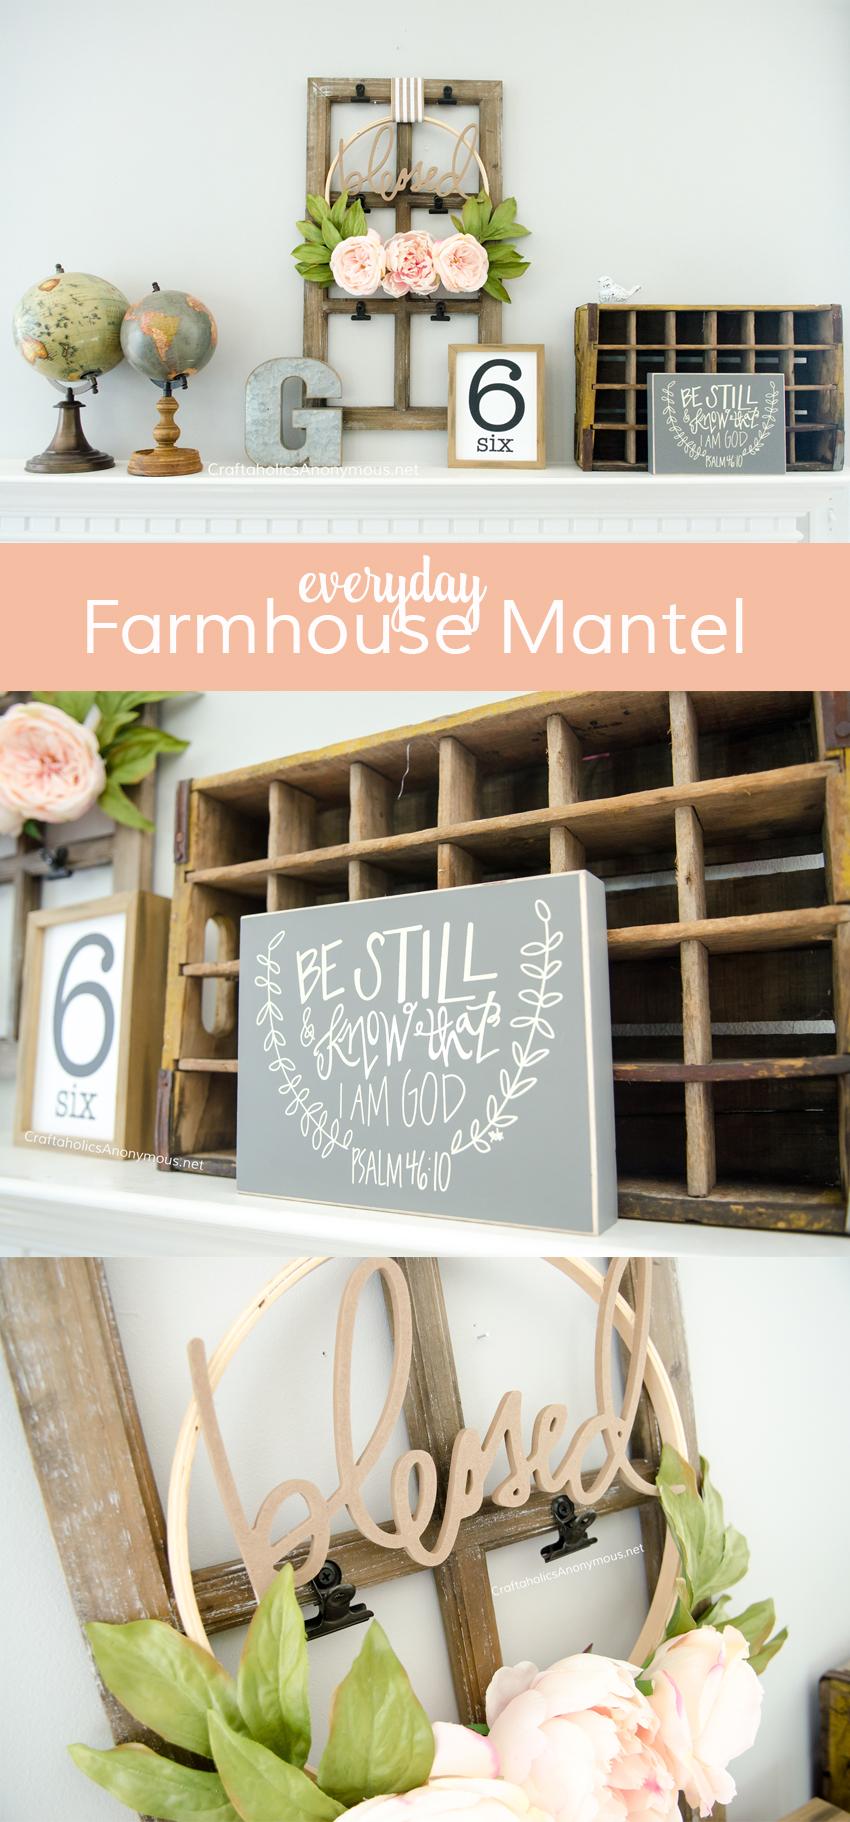 DIY Everyday Farmhouse mantel decor